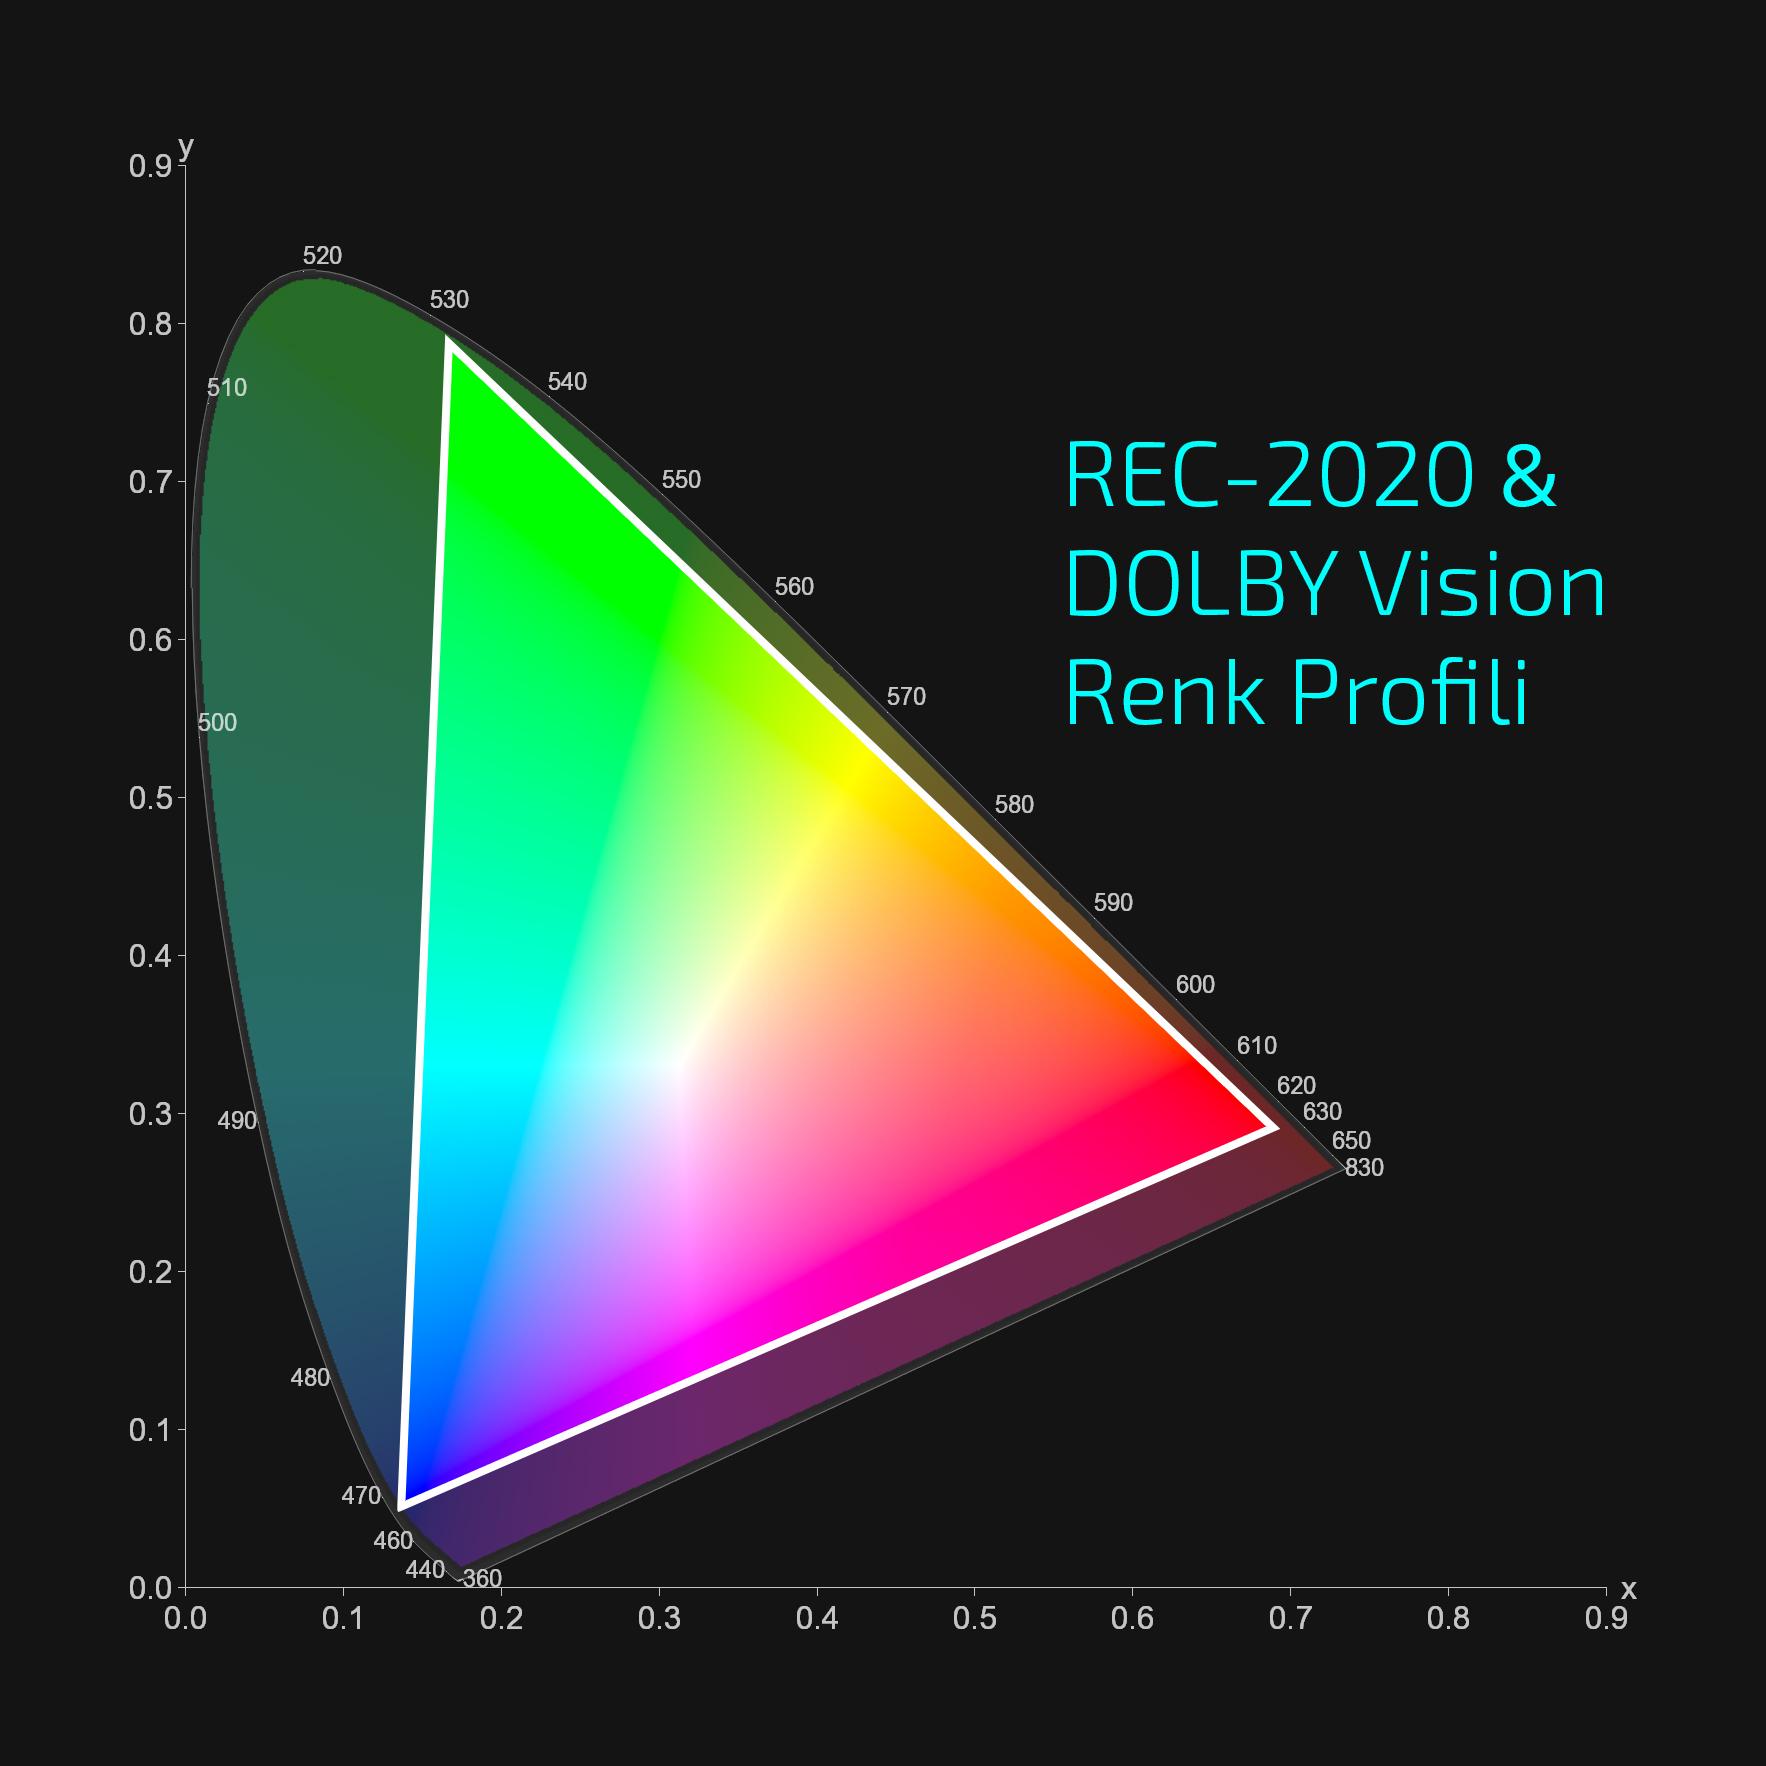 rec-2020 dolby.jpg